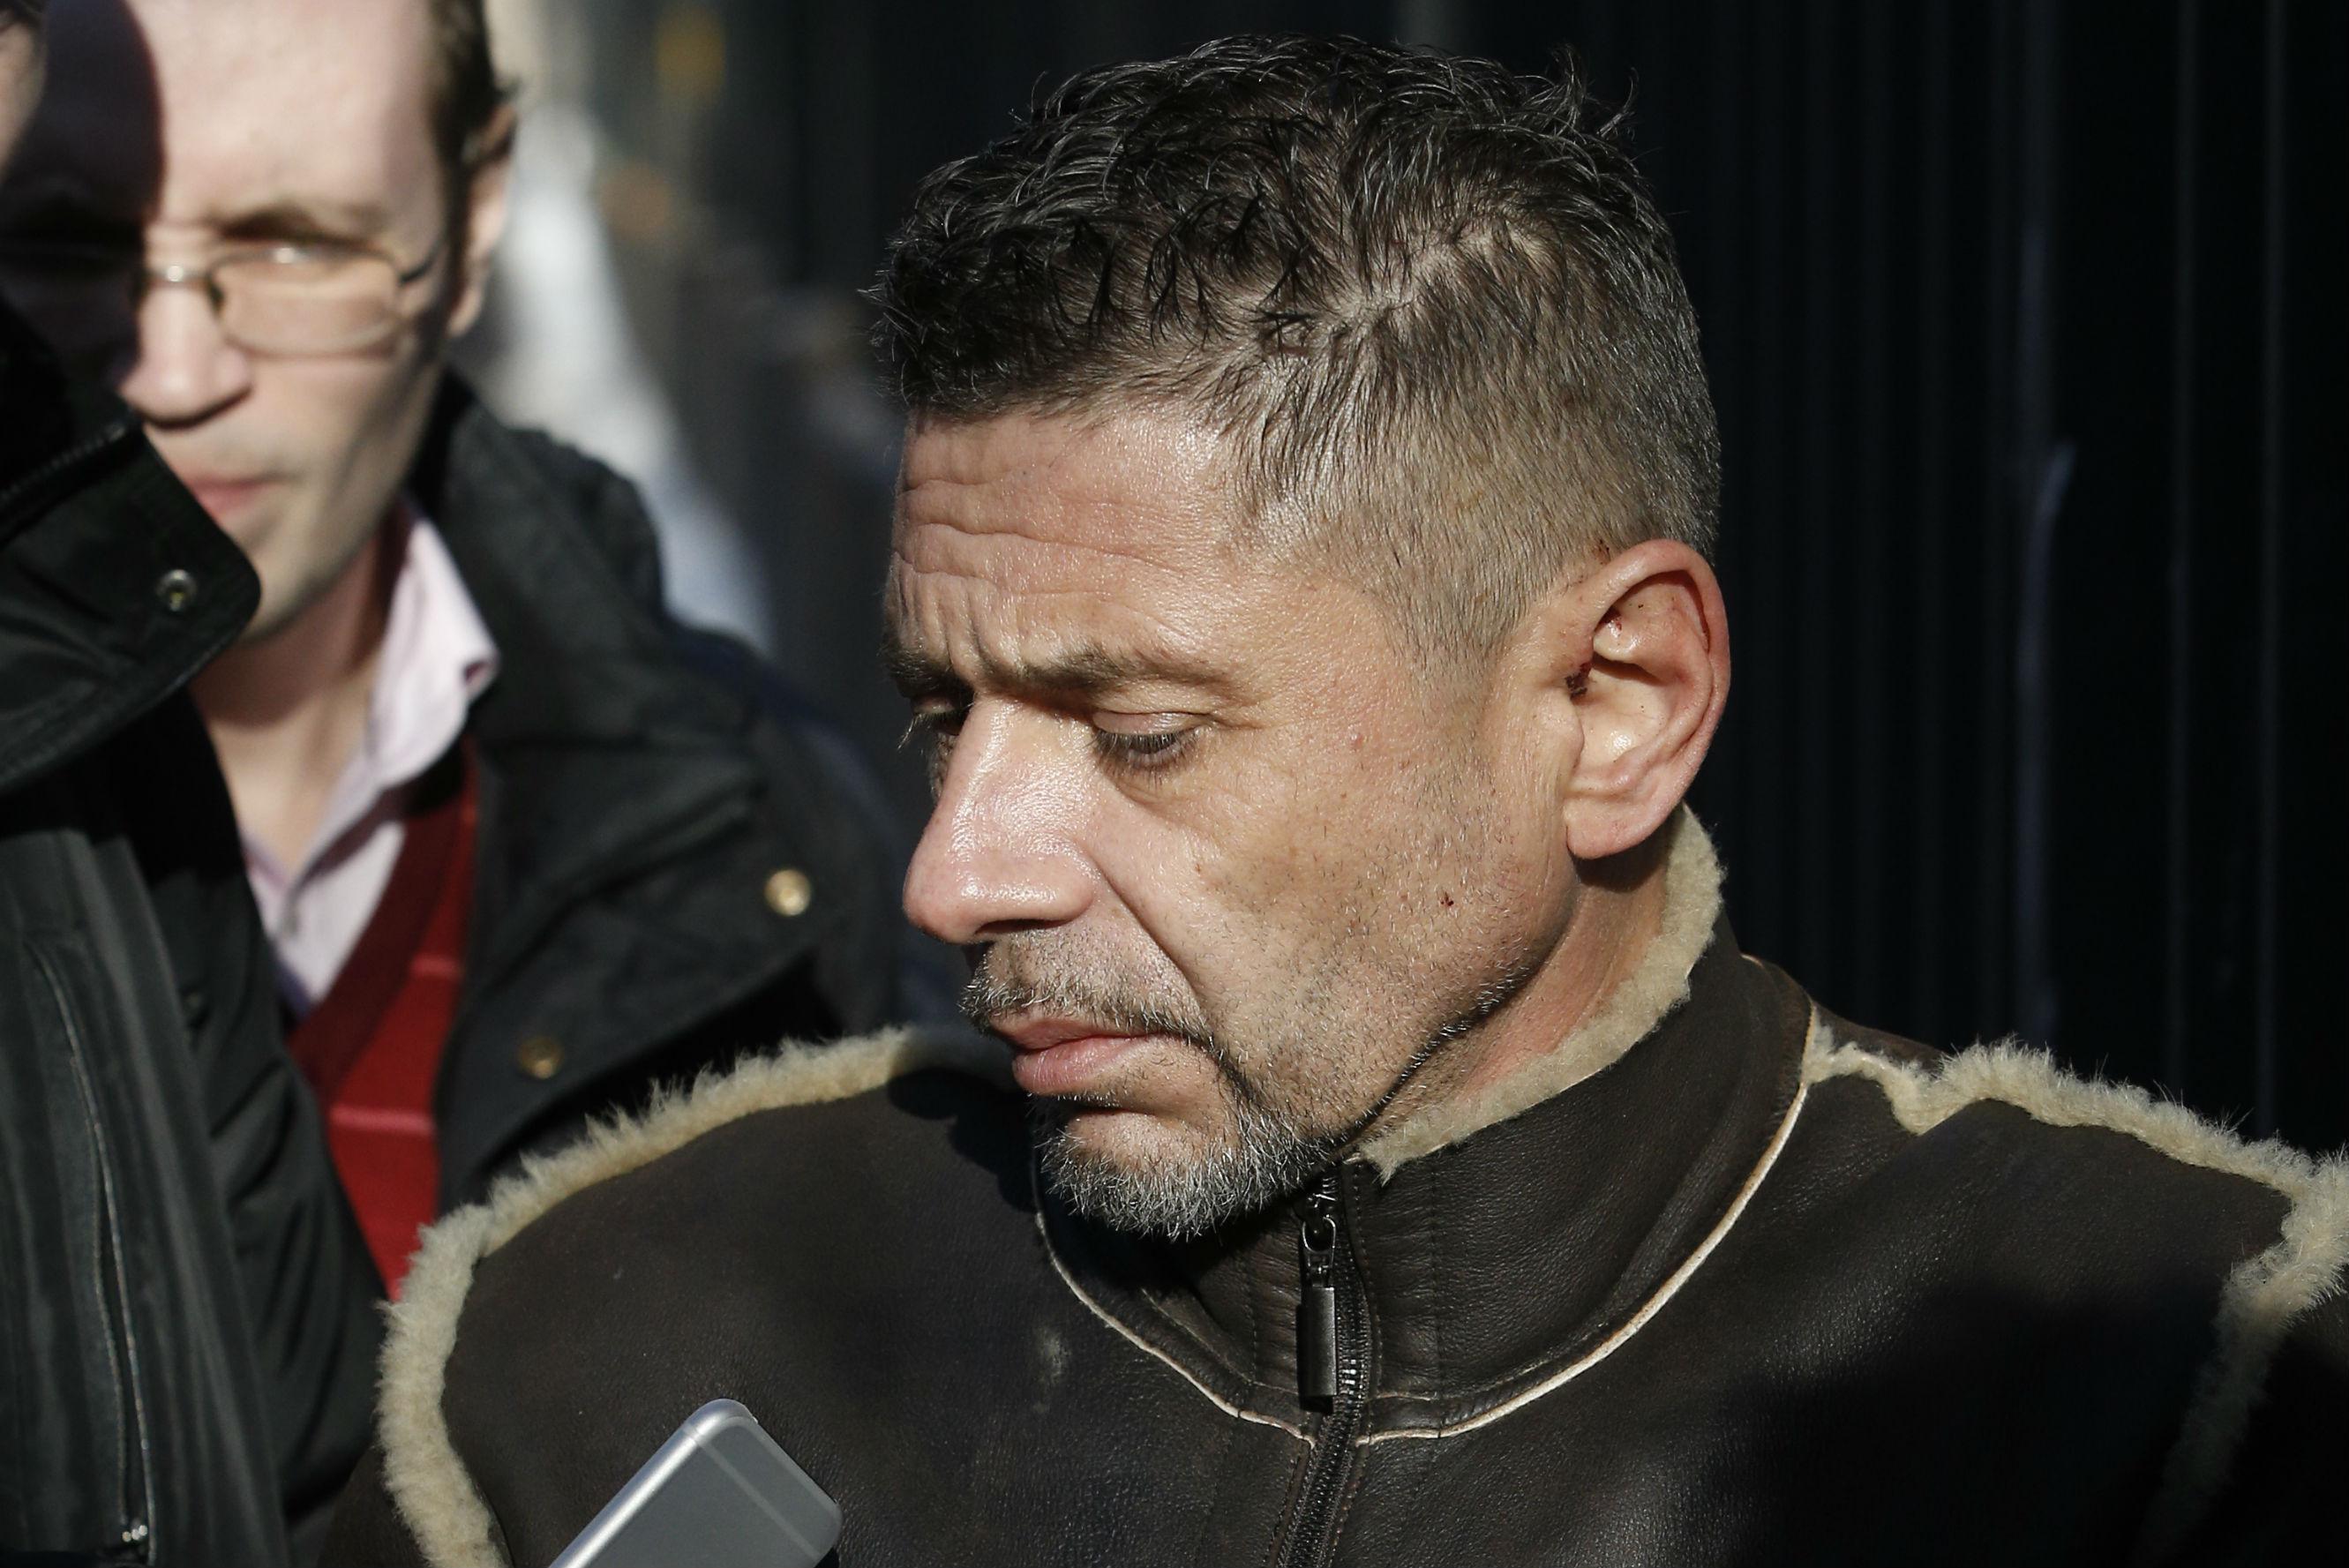 Актер Николаев доставлен в спецприёмник для отбывания наказания за ДТП. Фото: Александр Щербак/ТАСС